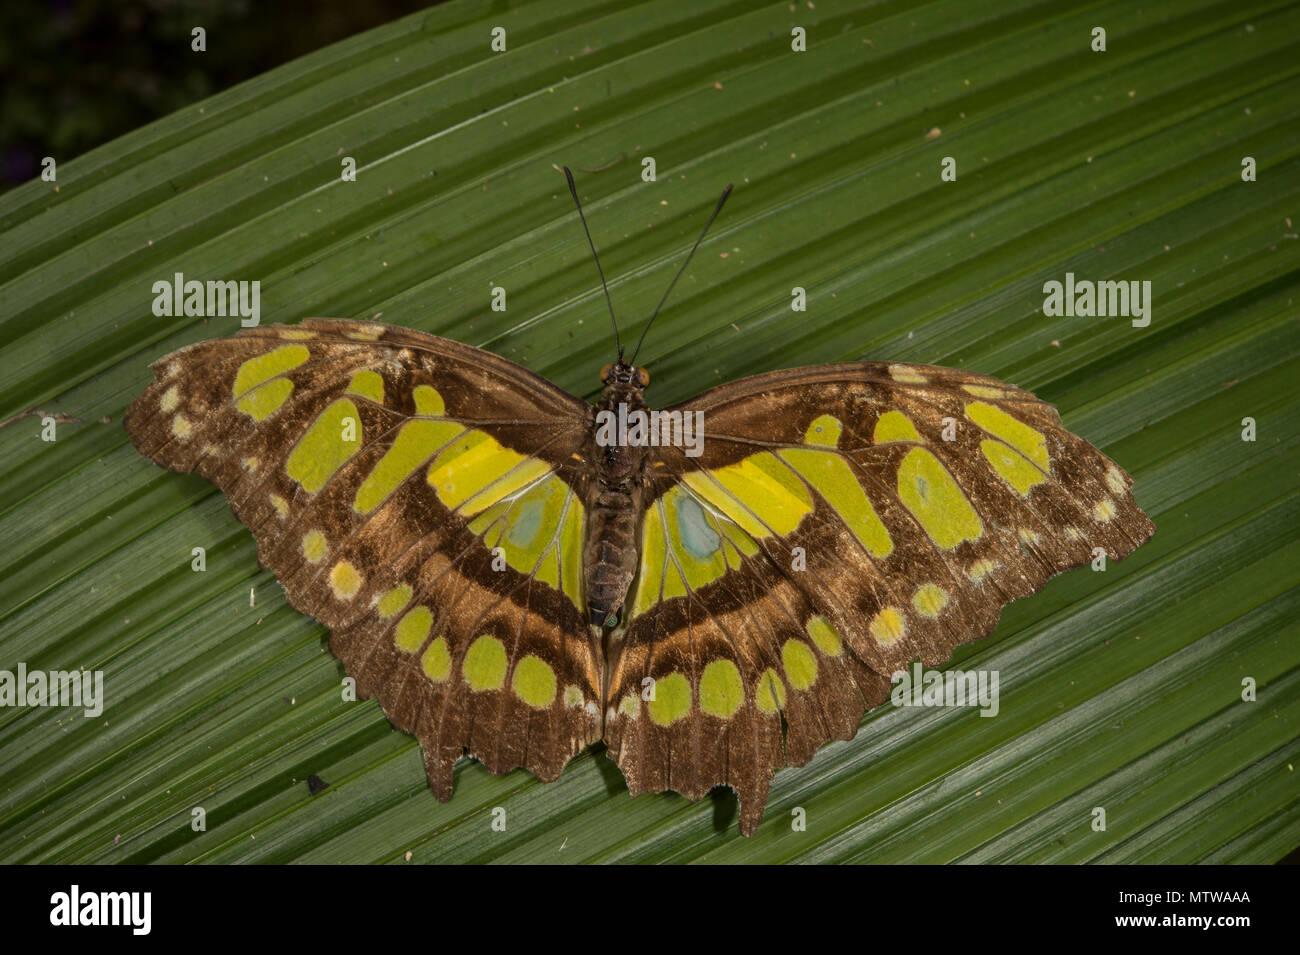 Malaquita, Siproeta stelenes, Nymphalidae, Costa Rica Foto de stock